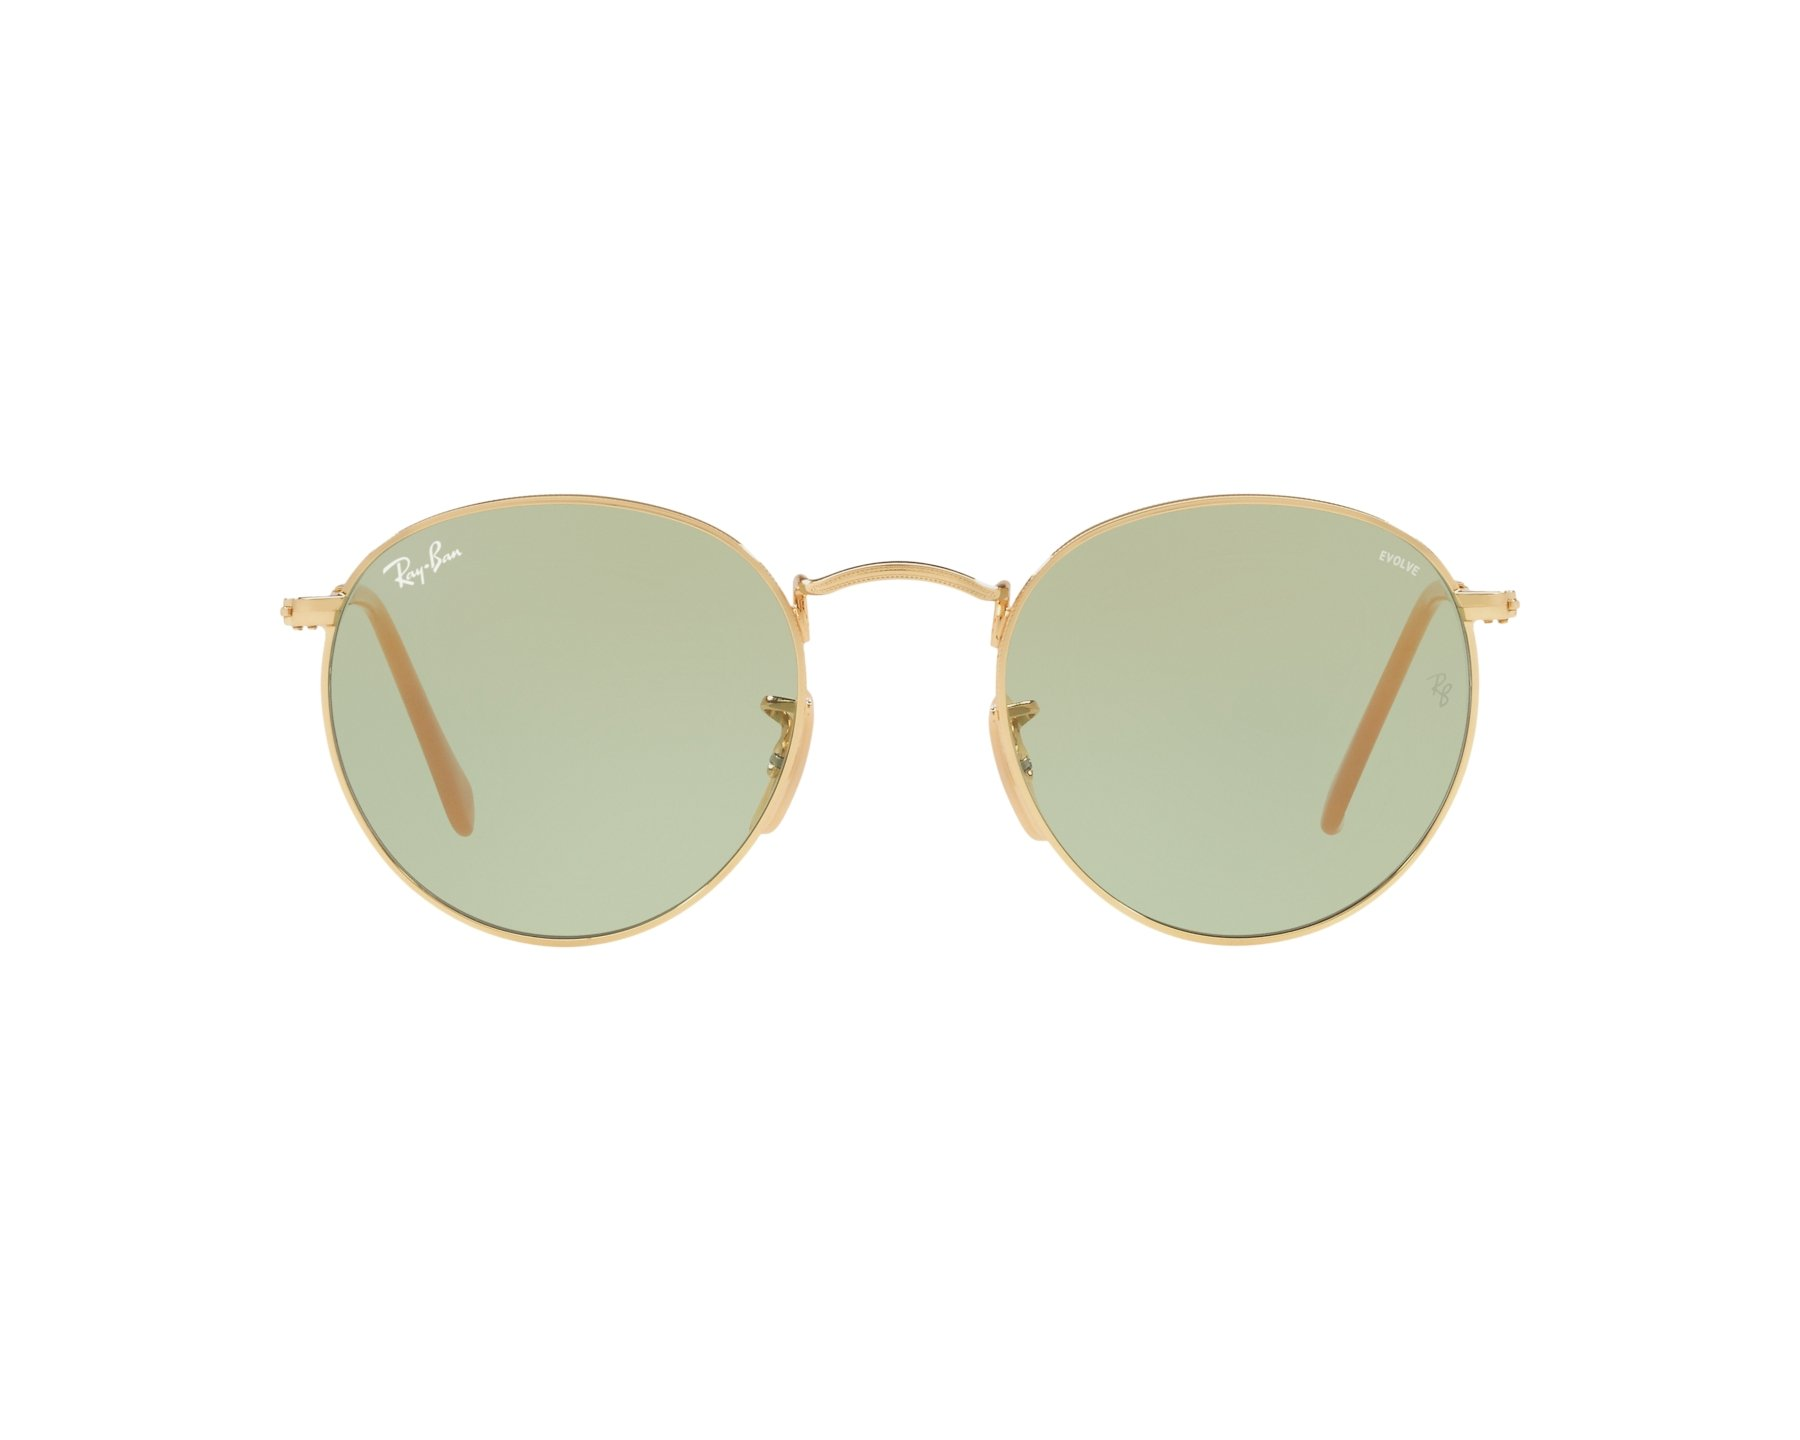 b40dd7fd35d0c Gafas de sol Ray-Ban RB-3447 90644C 50-21 Oro Vista de